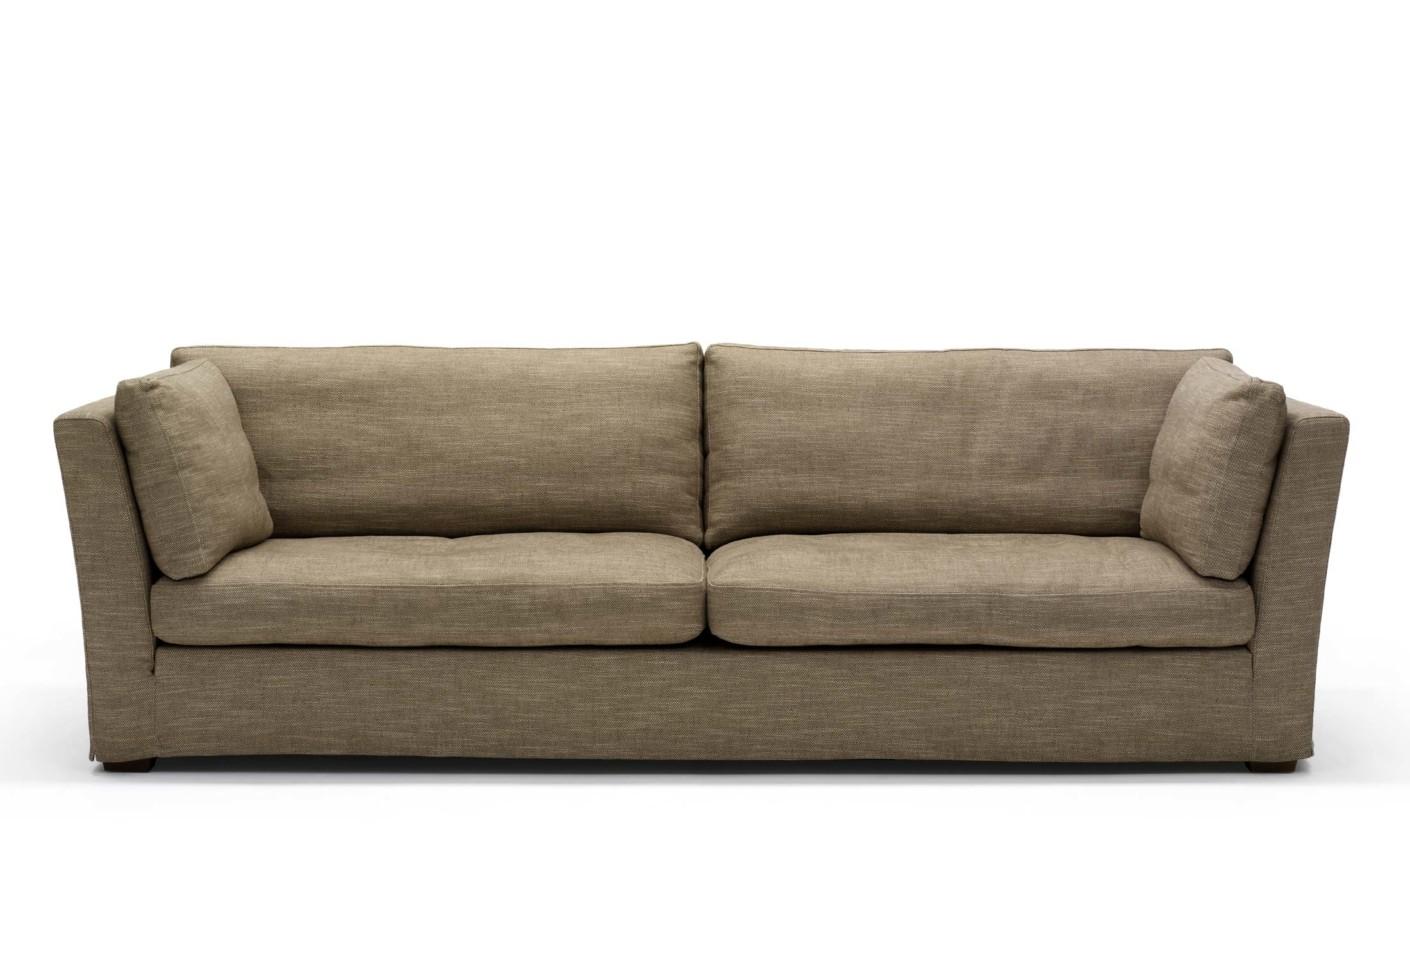 St Louis Sofa By Linteloo Stylepark